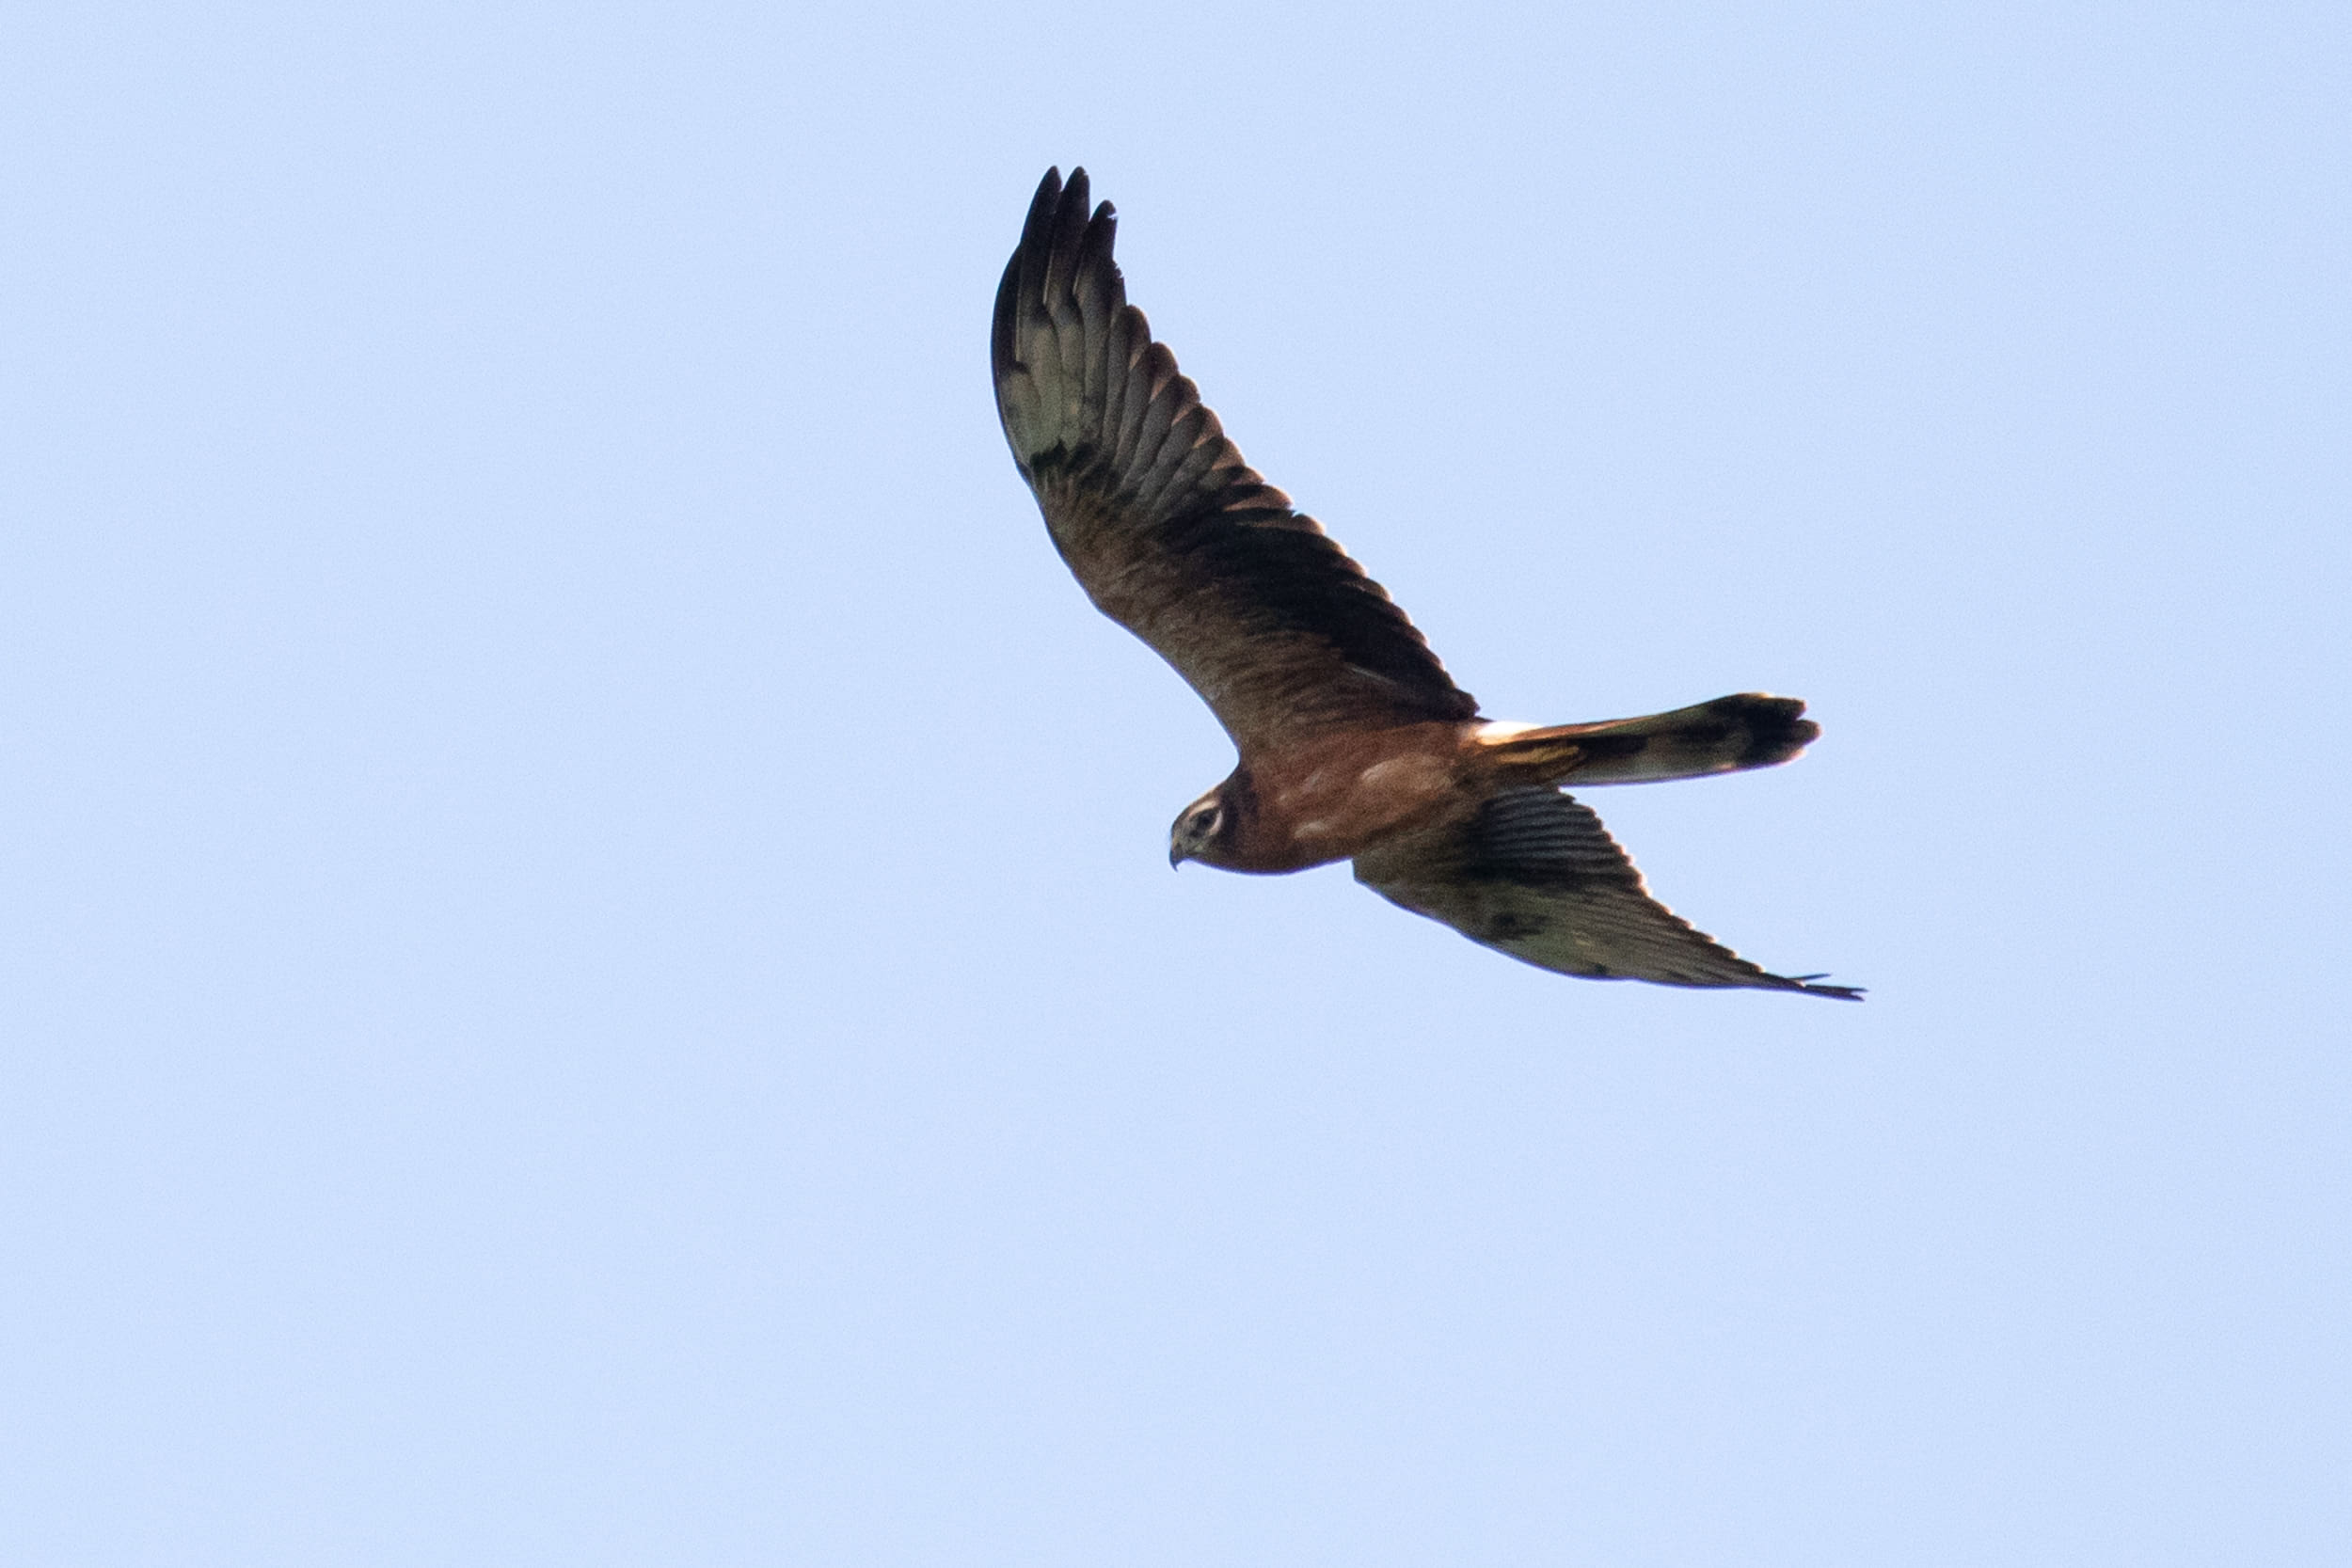 Juvenile Montagu's Harrier. Photo by Bart Hoekstra.